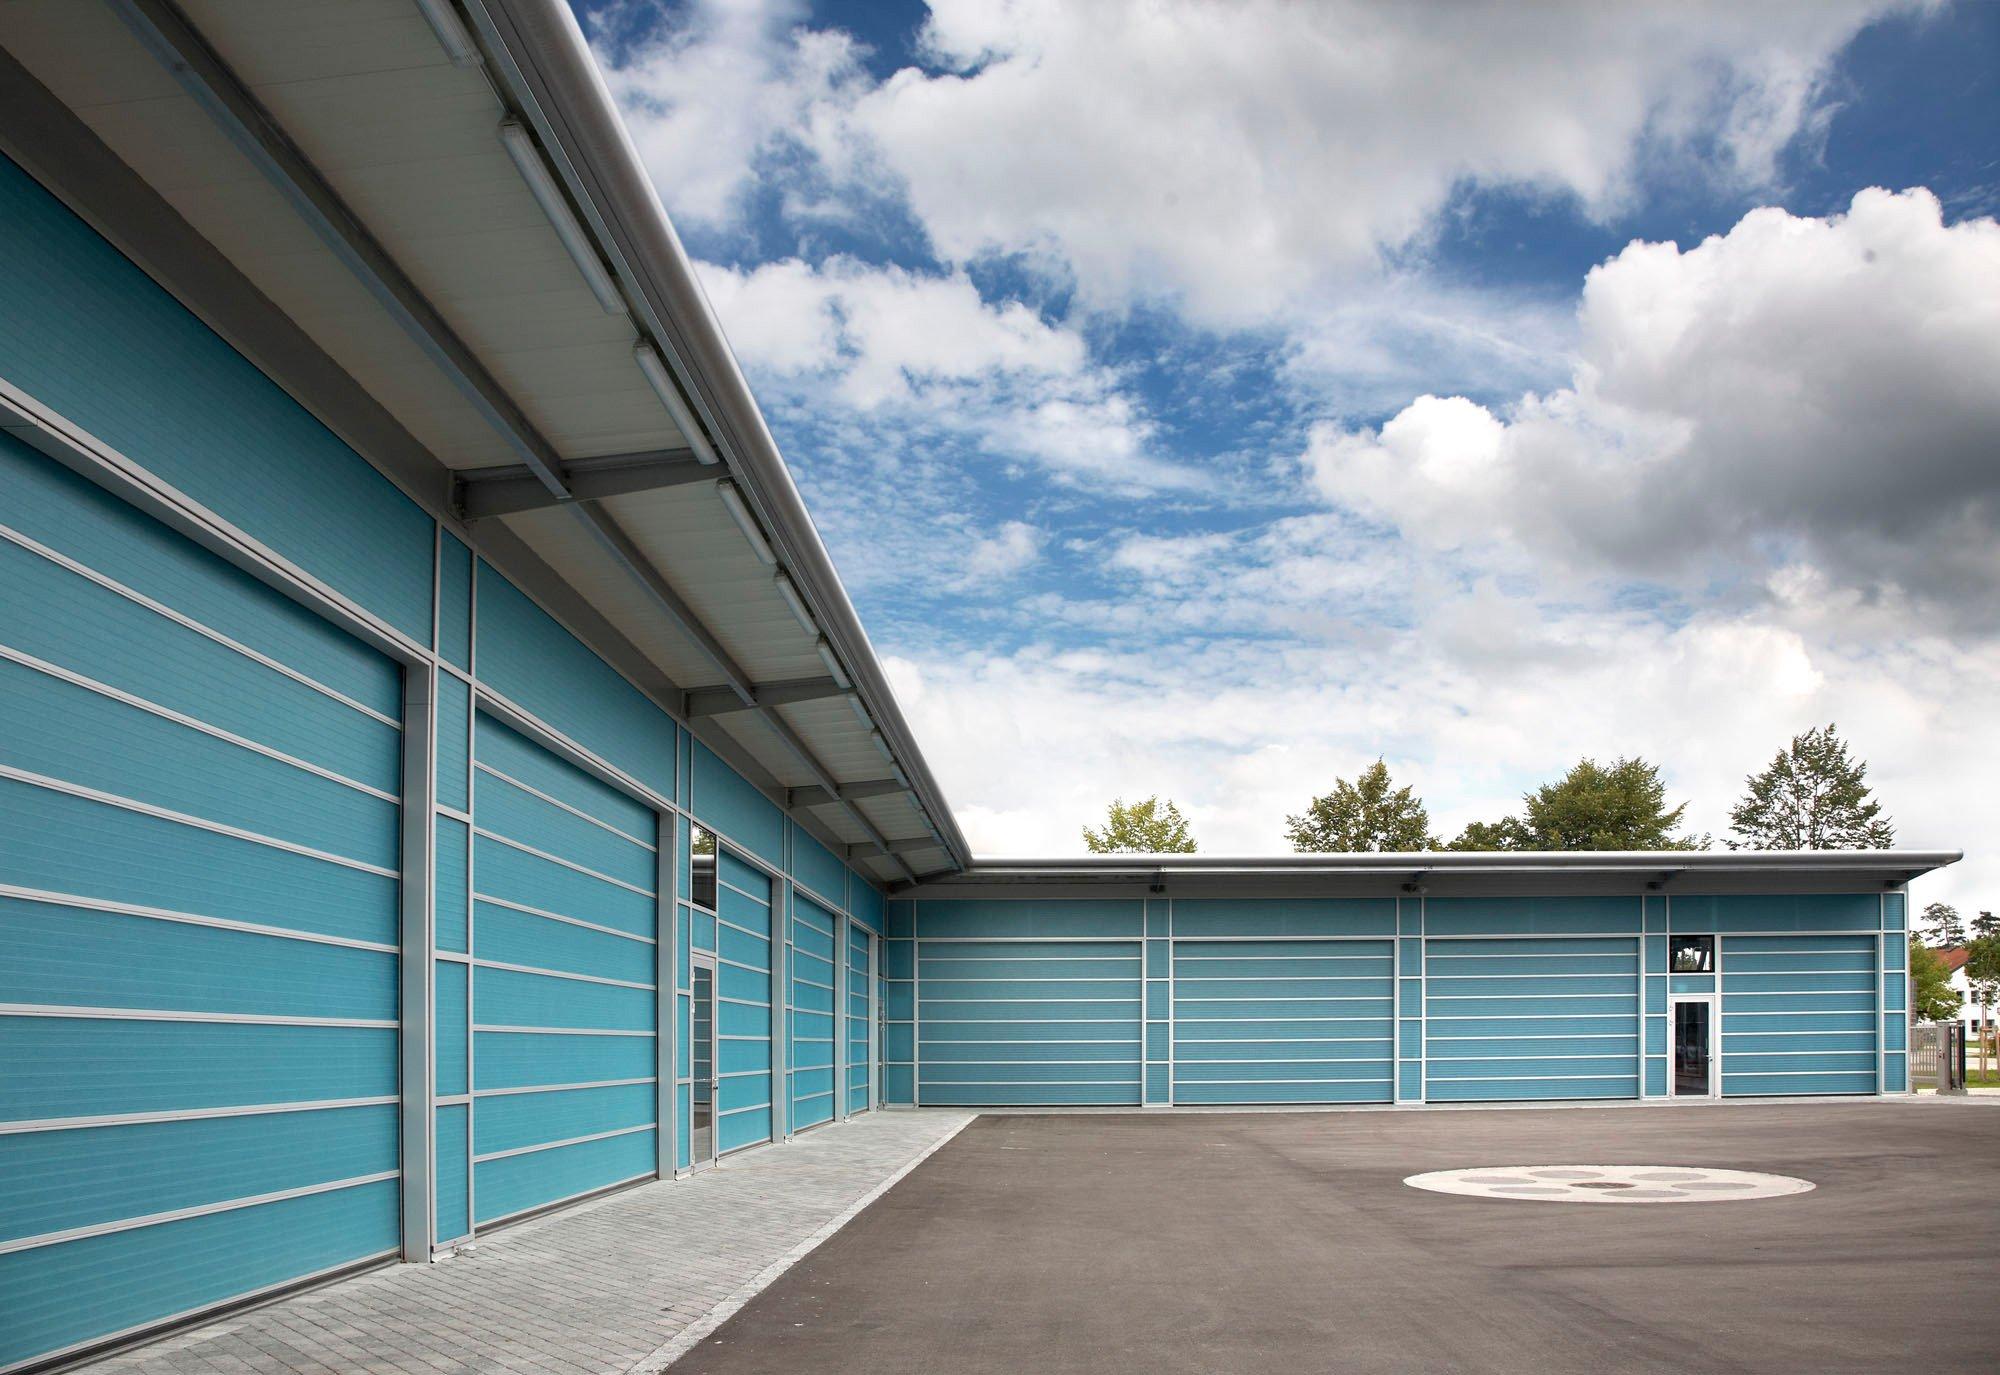 Schieferfassade mit unsichtbarer befestigung fassade for Fenster 0 5 ug